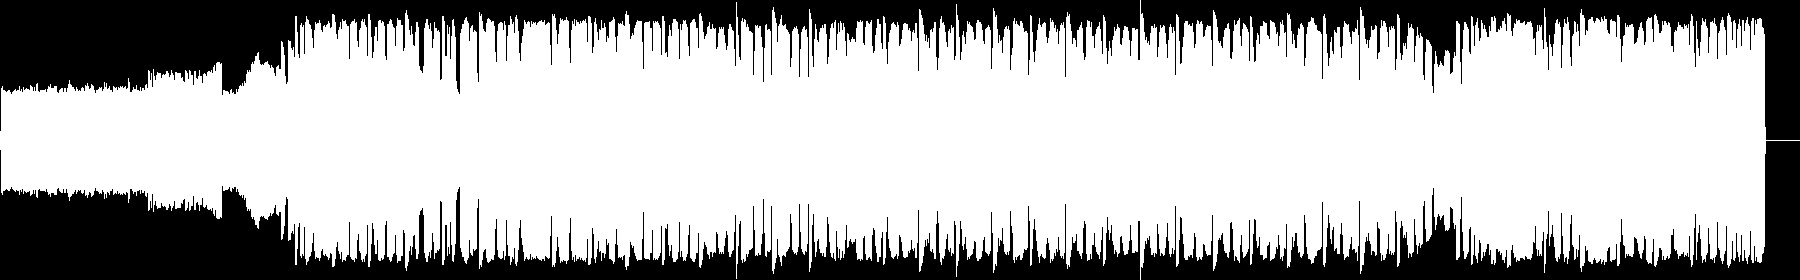 Dubstep Razor 2 audio waveform